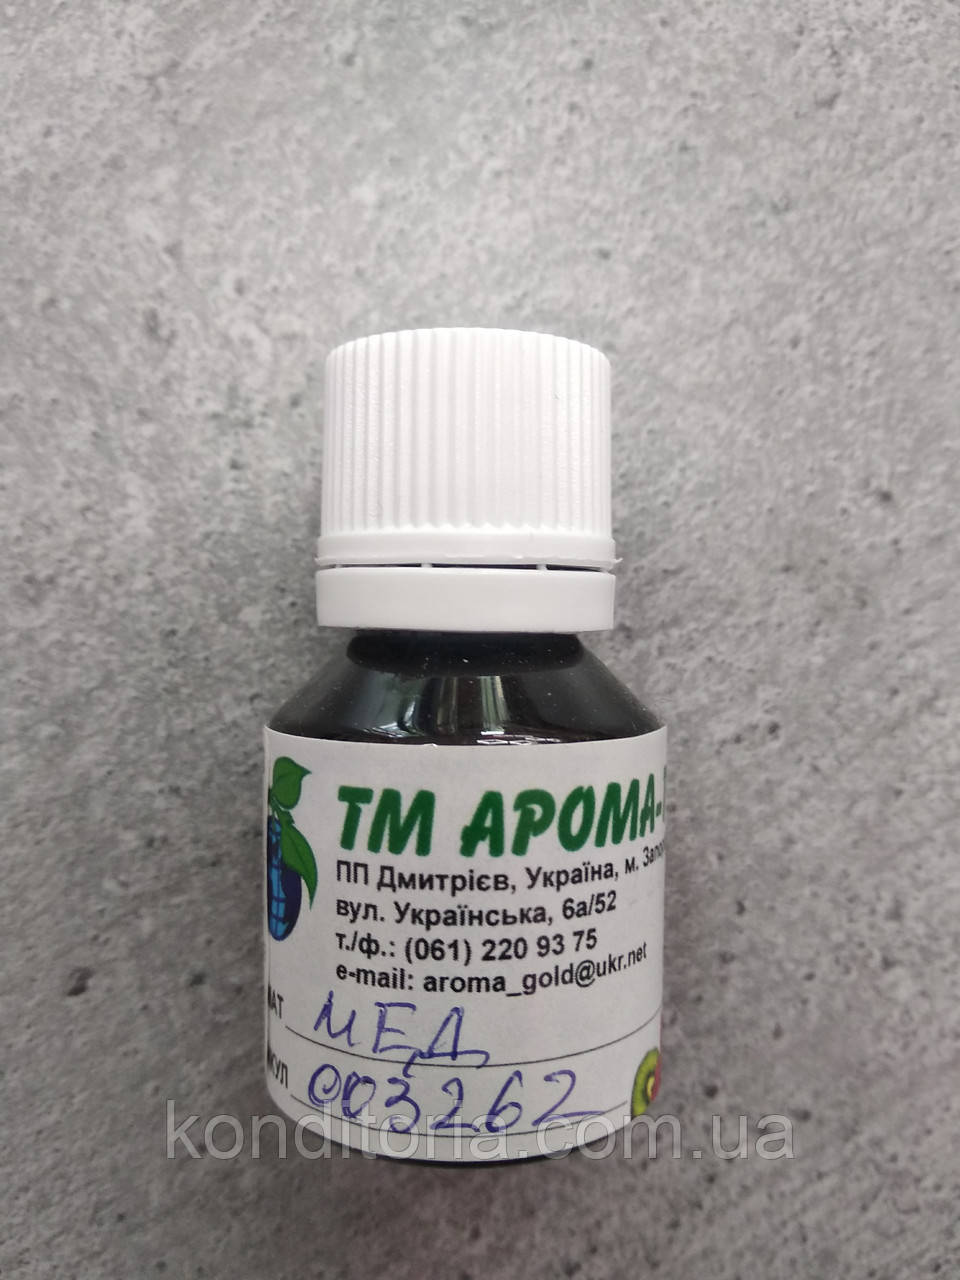 Ароматизатор харчовий мед ТМ Арома-голд